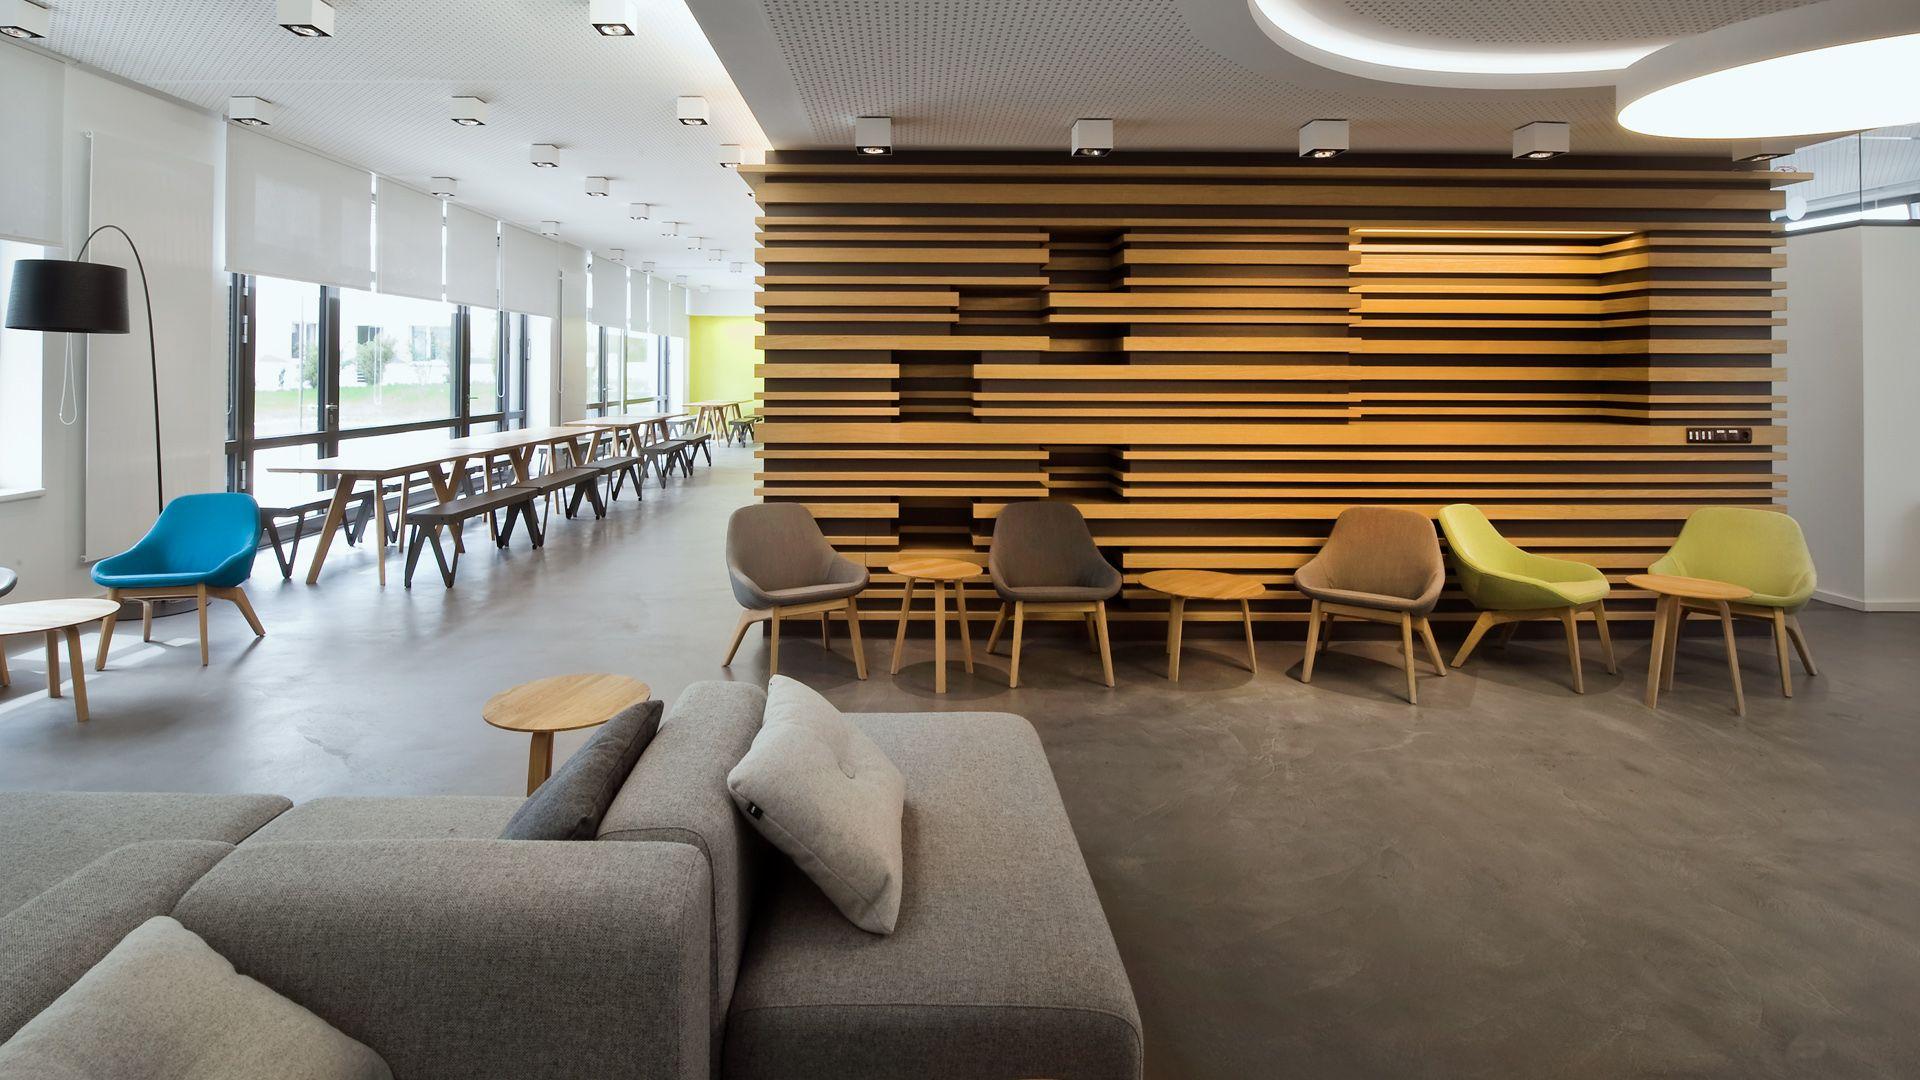 CAMPUS VIVA // new dorm in Heidelberg // generous common areas ...